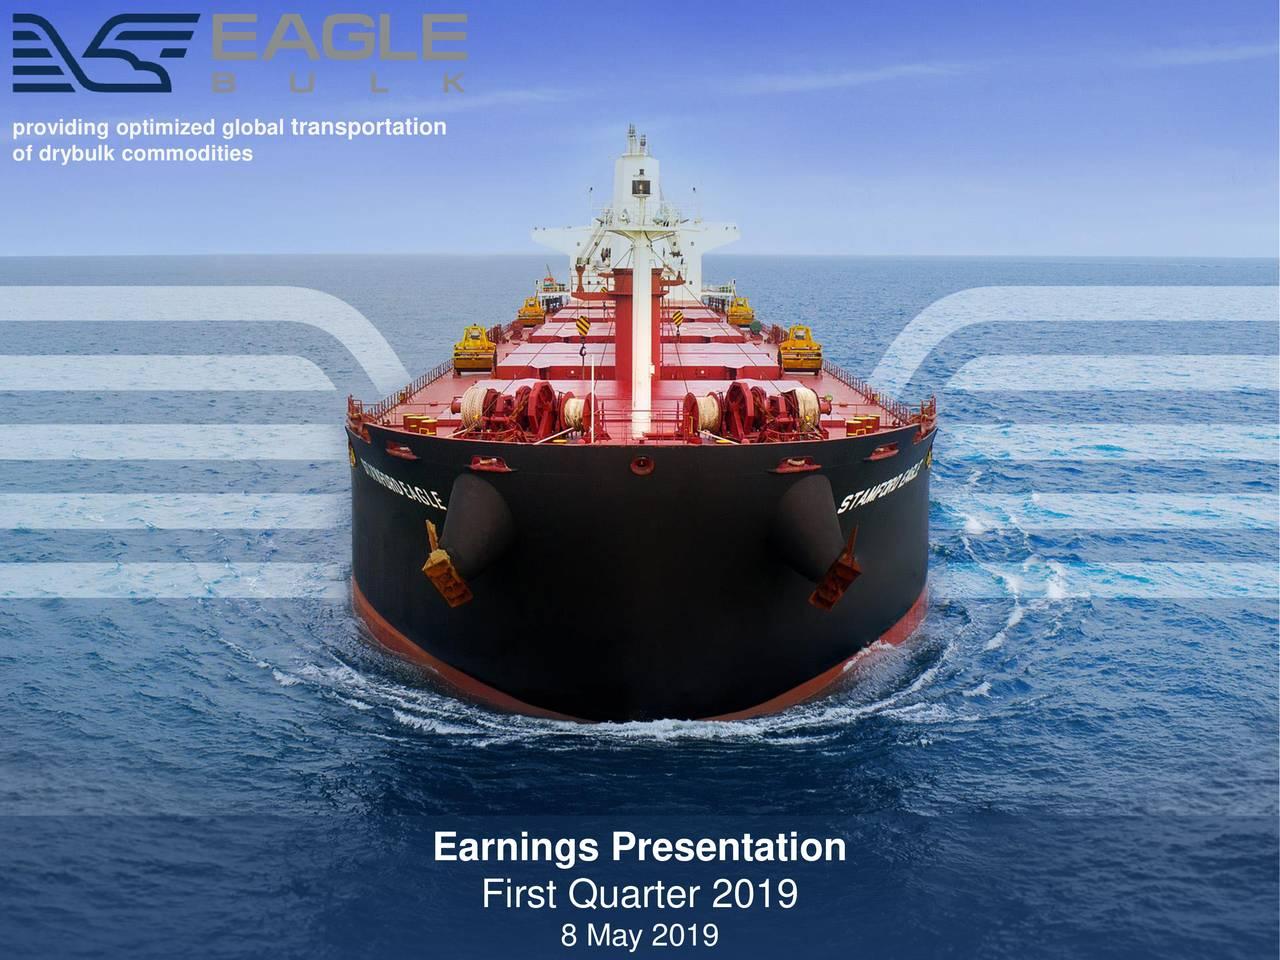 of drybulk commodities Earnings Presentation First Quarter 2019